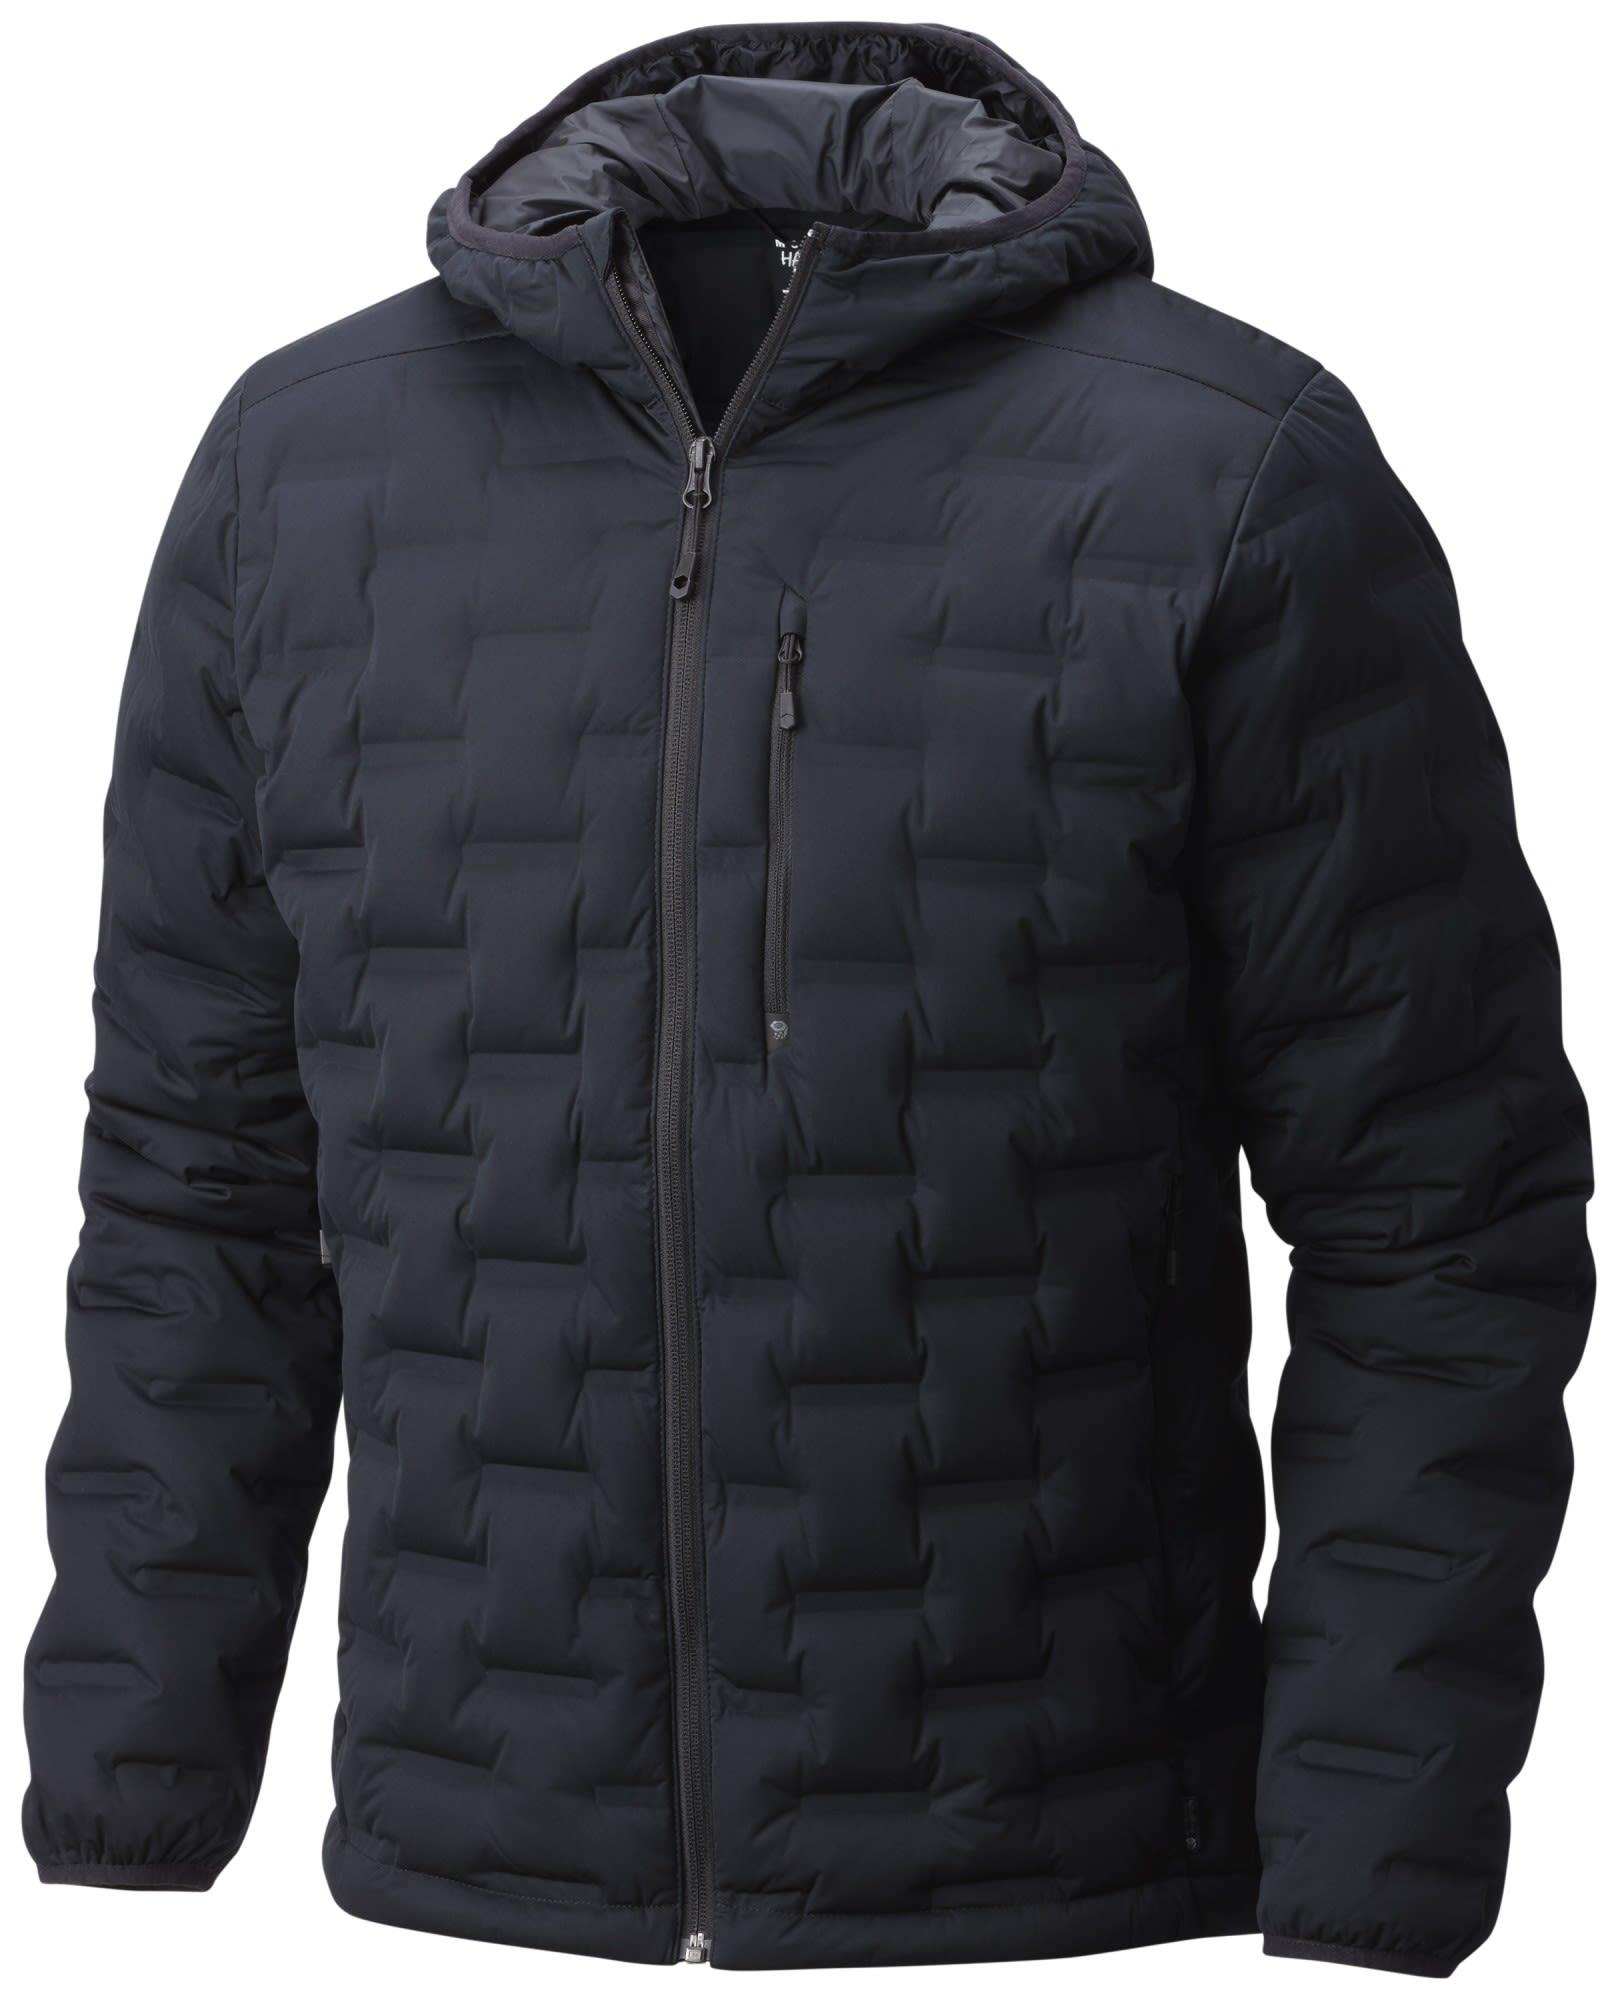 Mountain Hardwear M Stretchdown DS Hooded Jacket | Größe S,M,L,XL | Herren Fre